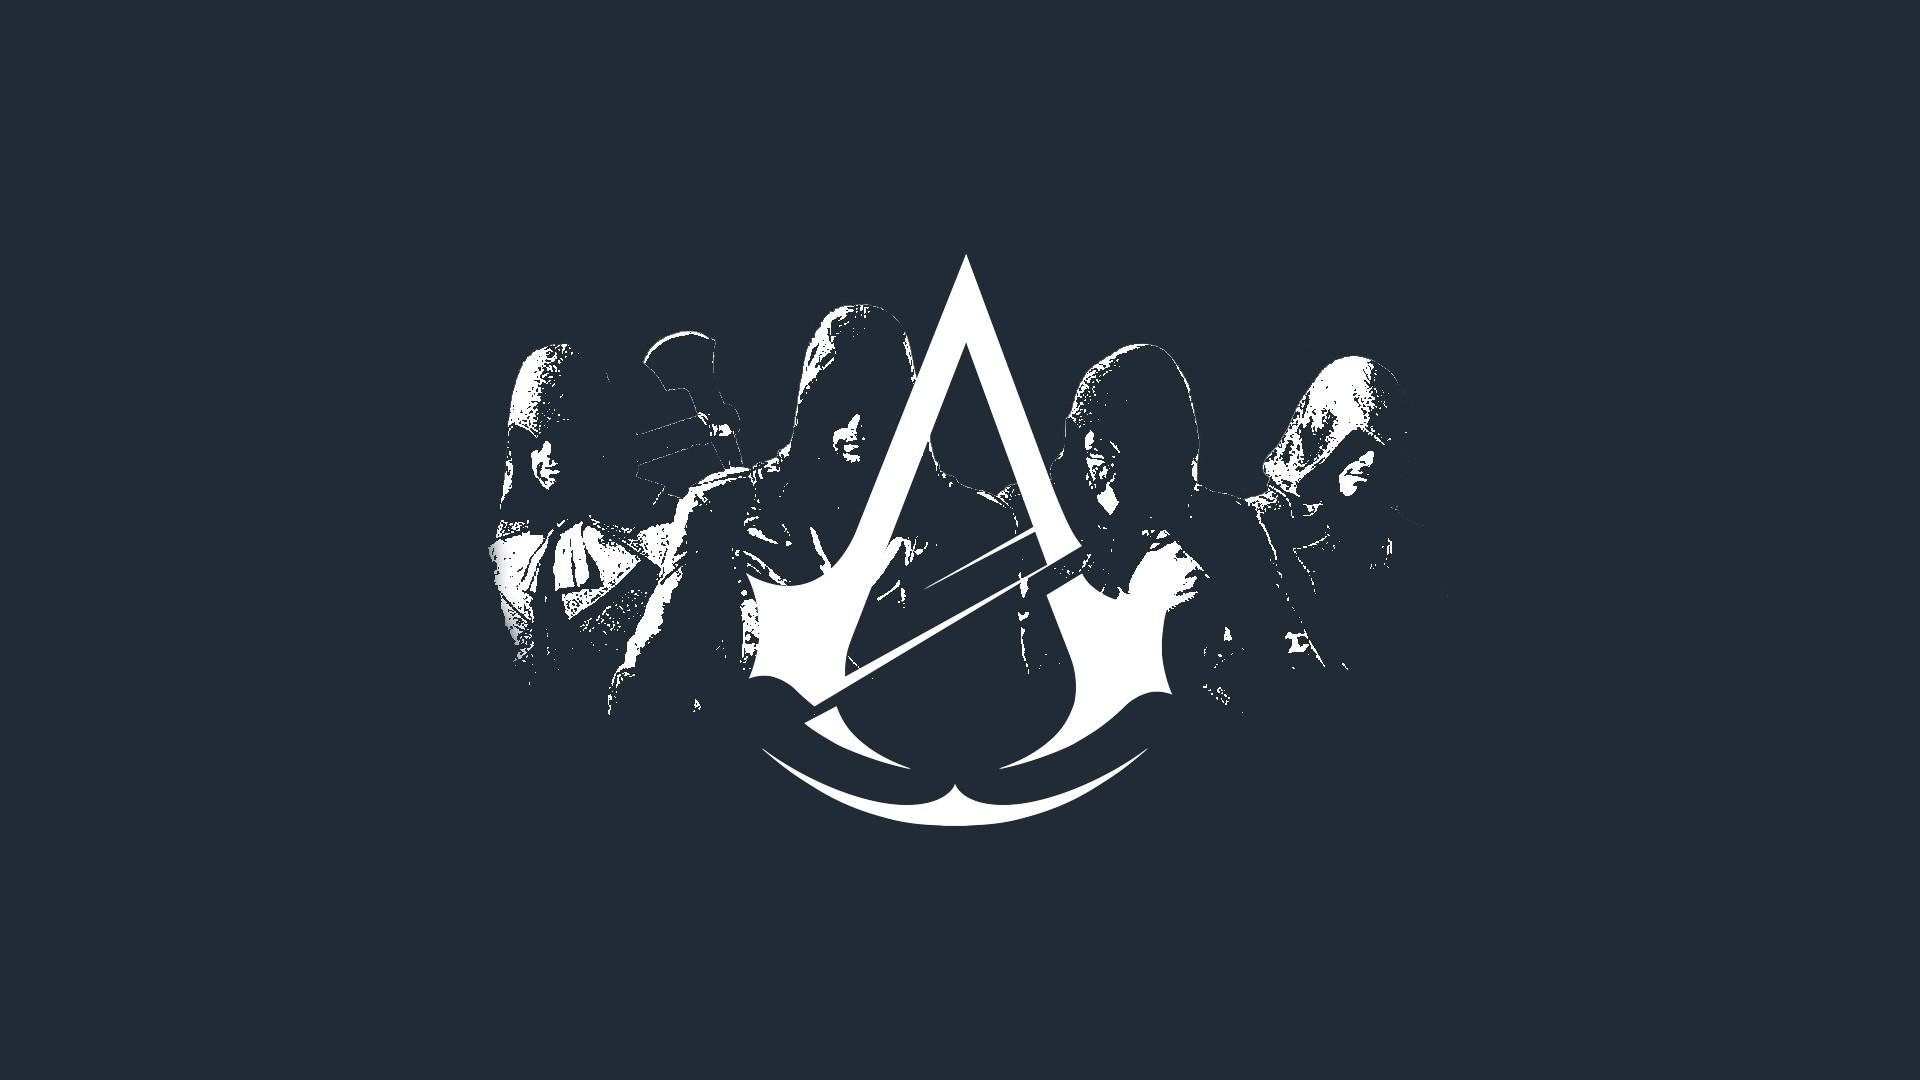 Wallpaper Assassin S Creed Assassin S Creed Unity 1920x1080